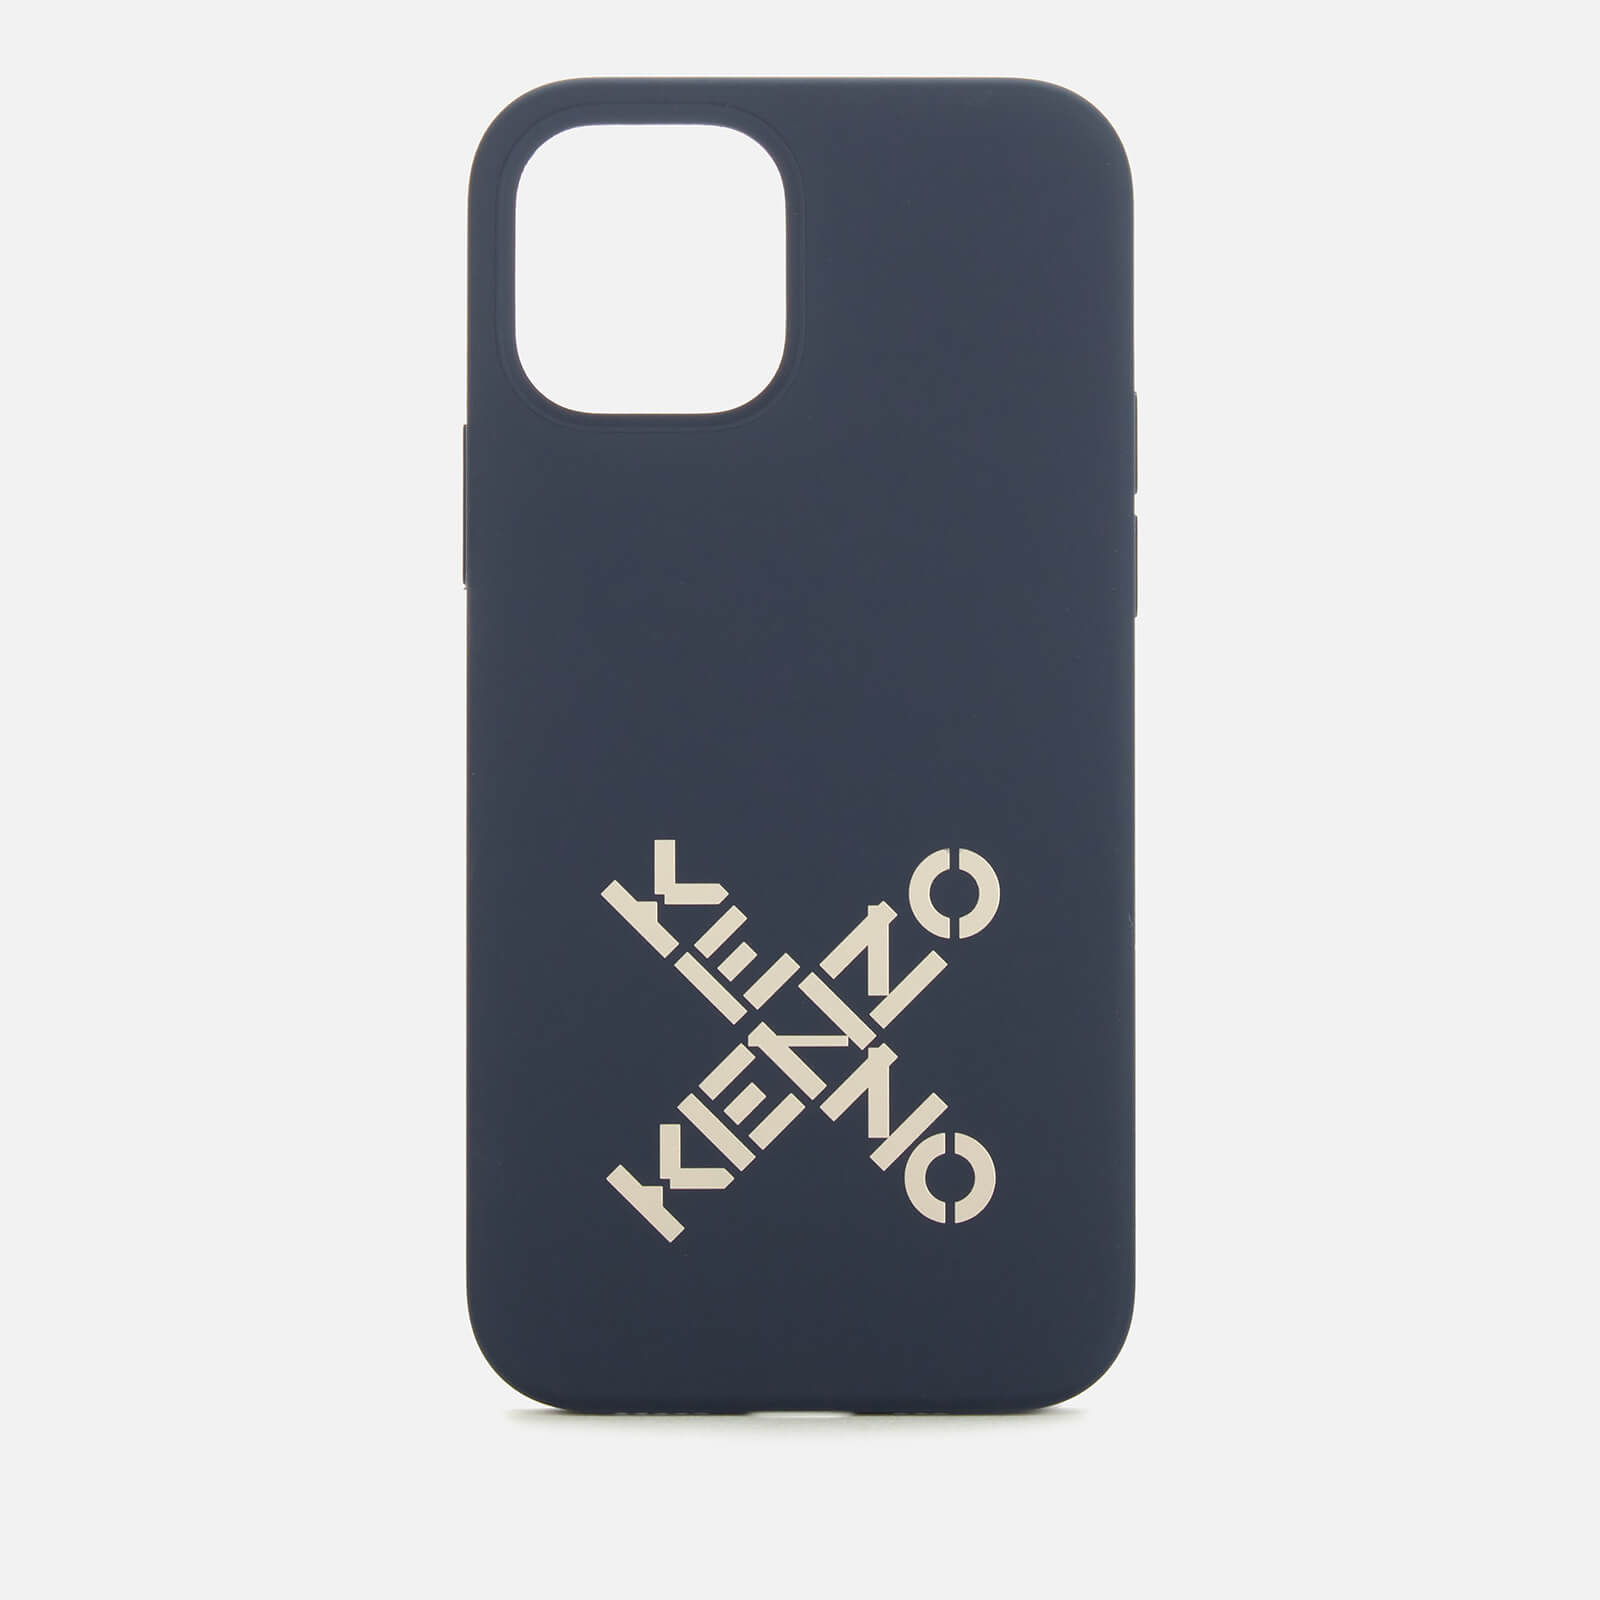 KENZO Men's Sport iPhone 12 Pro Phone Case - Navy Blue